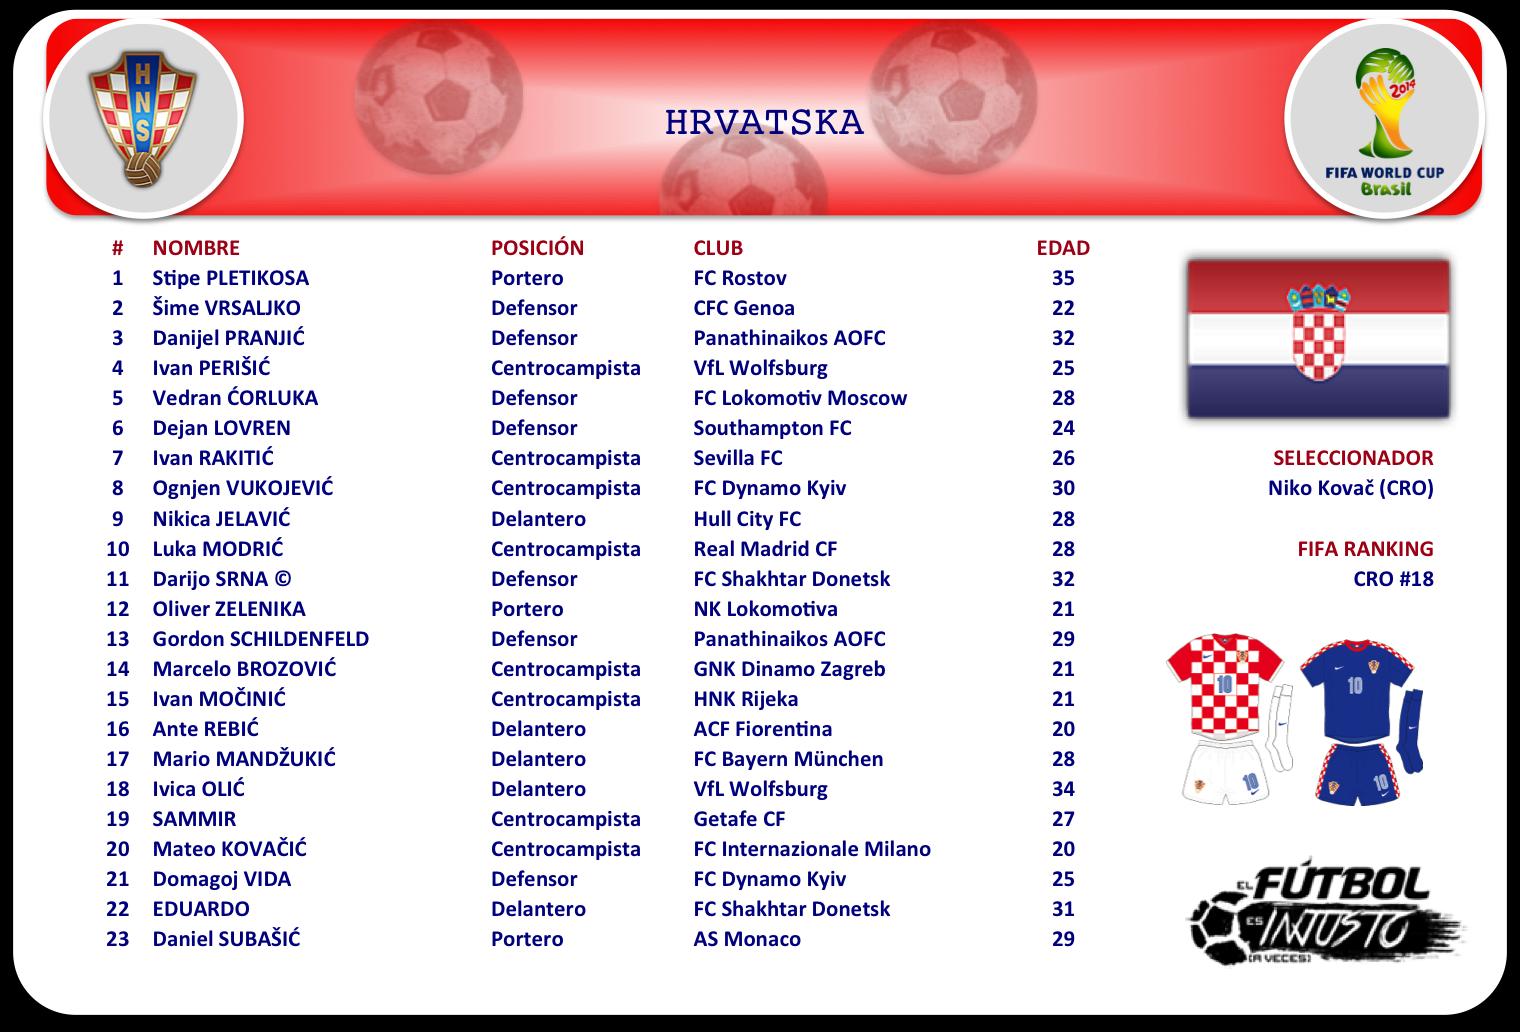 Lista de convocados de Croacia